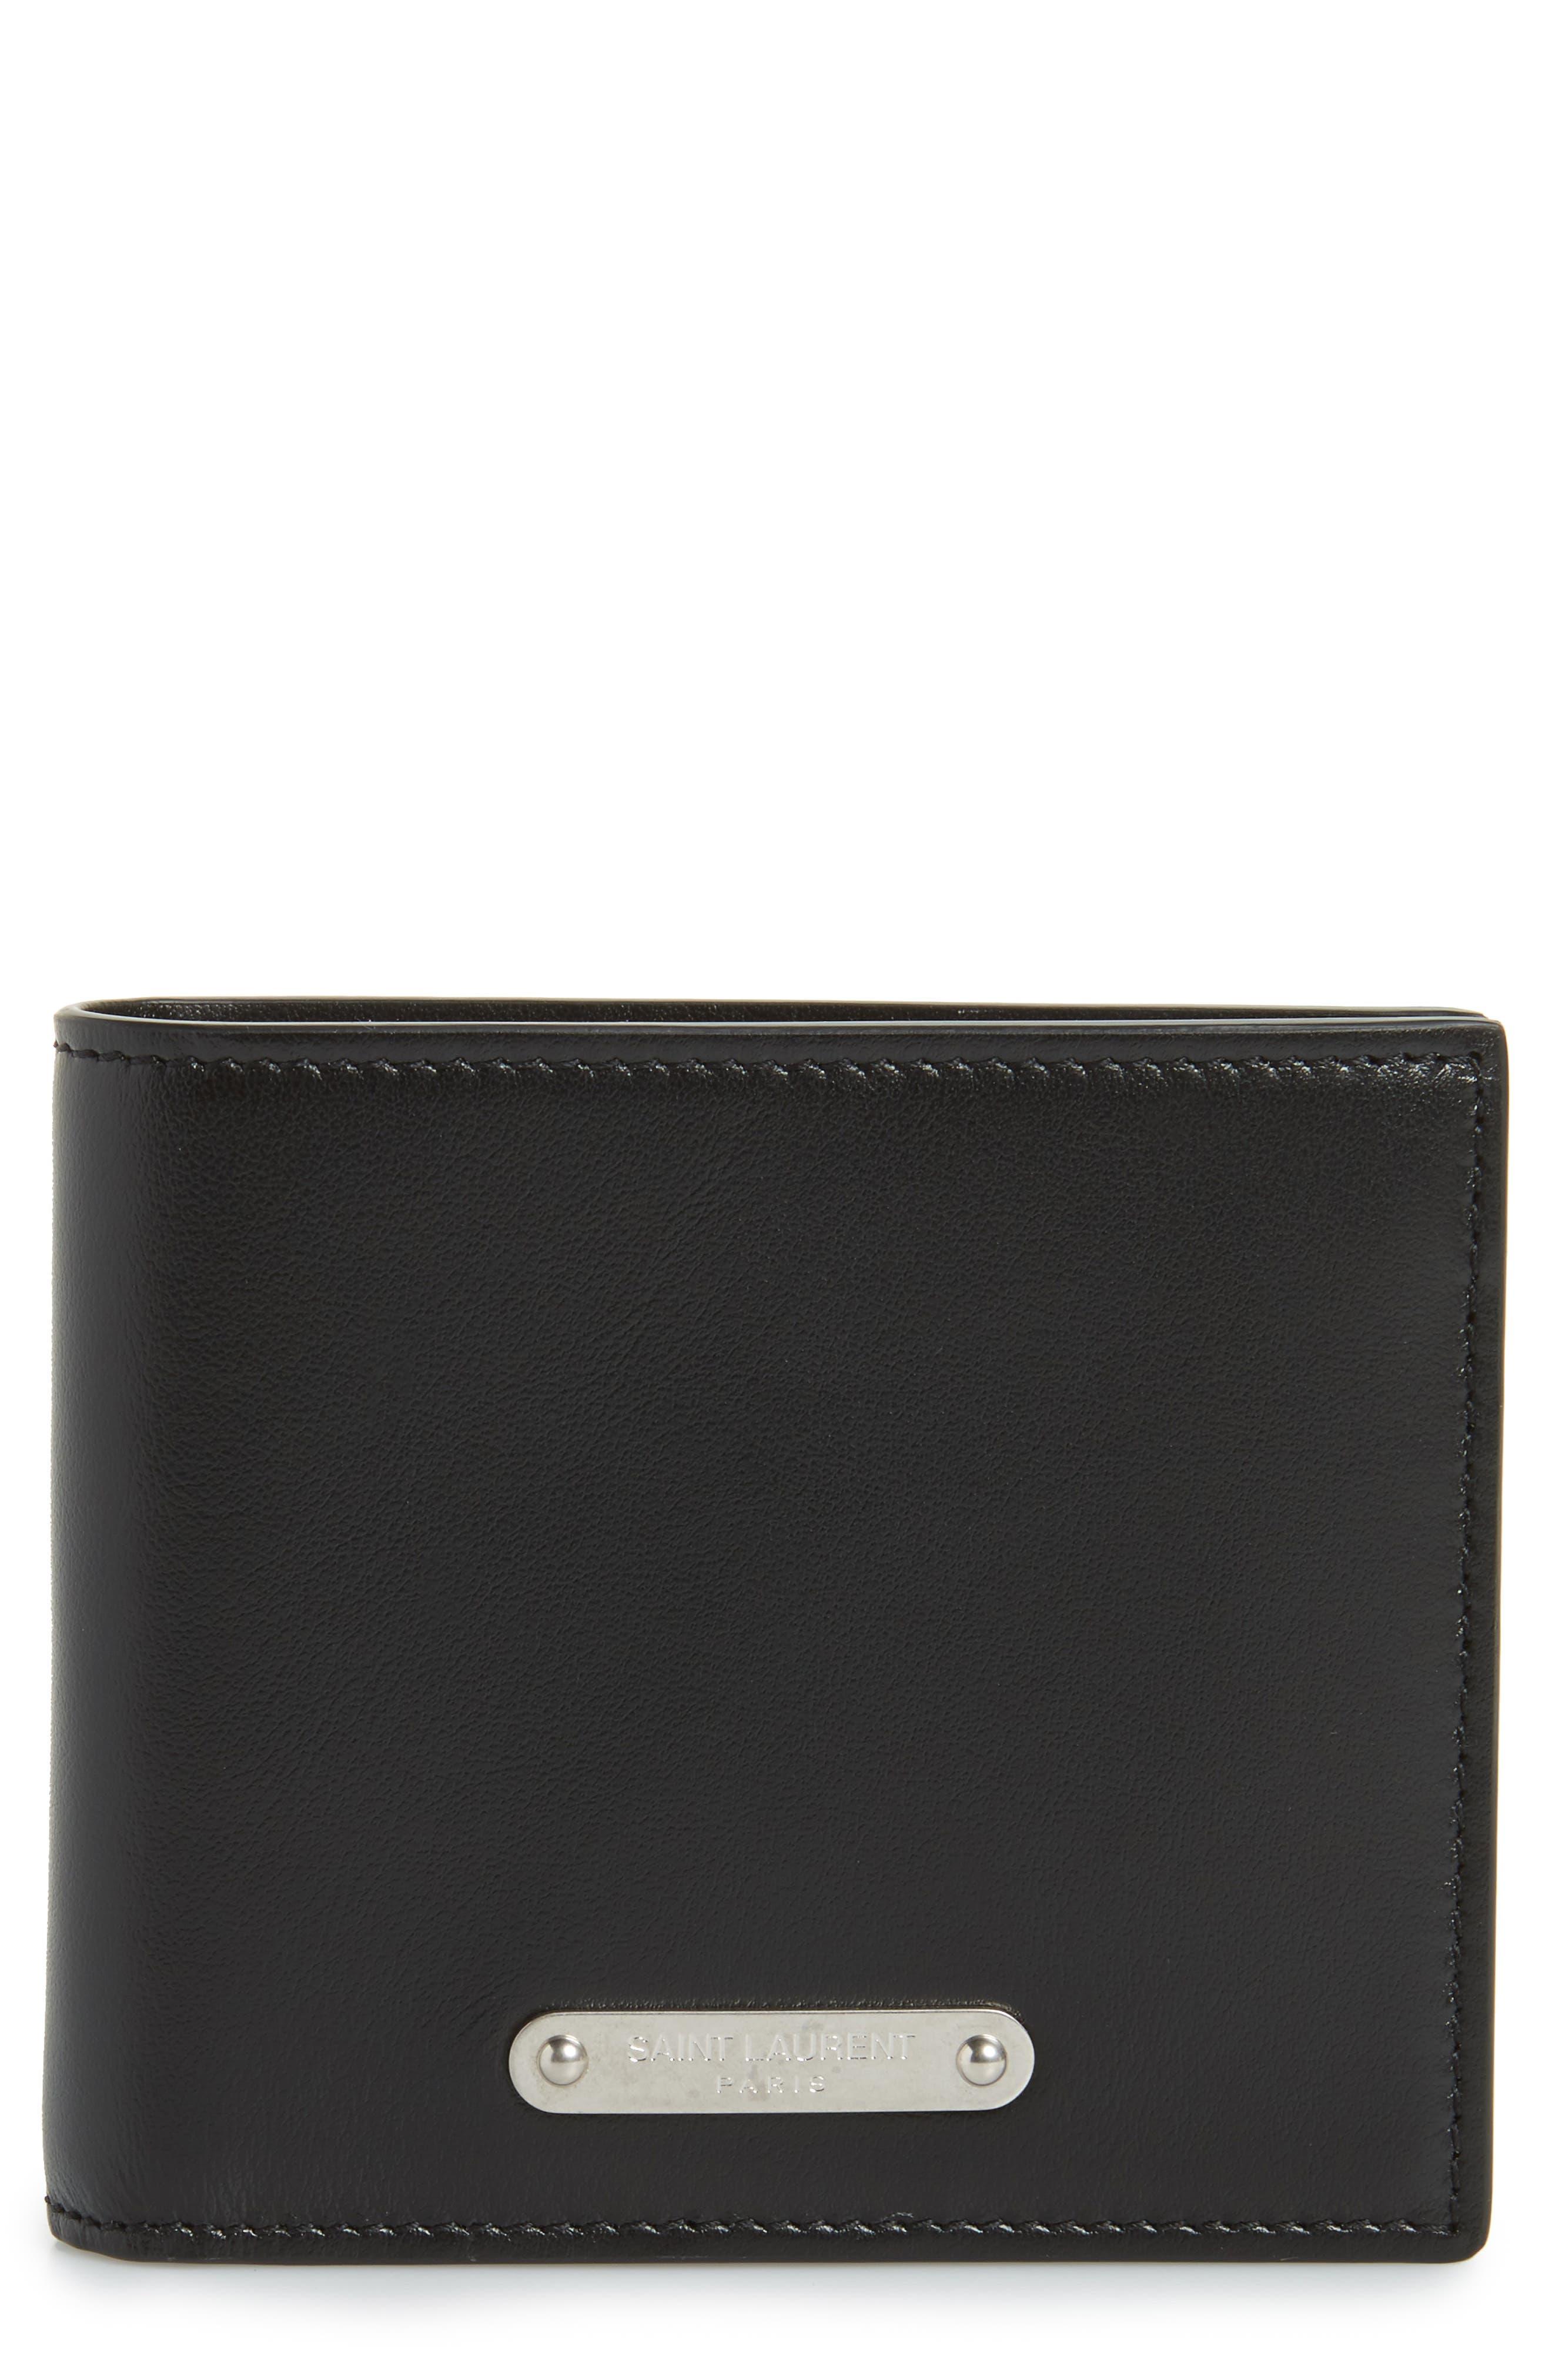 East/West Leather Wallet,                             Main thumbnail 1, color,                             Black